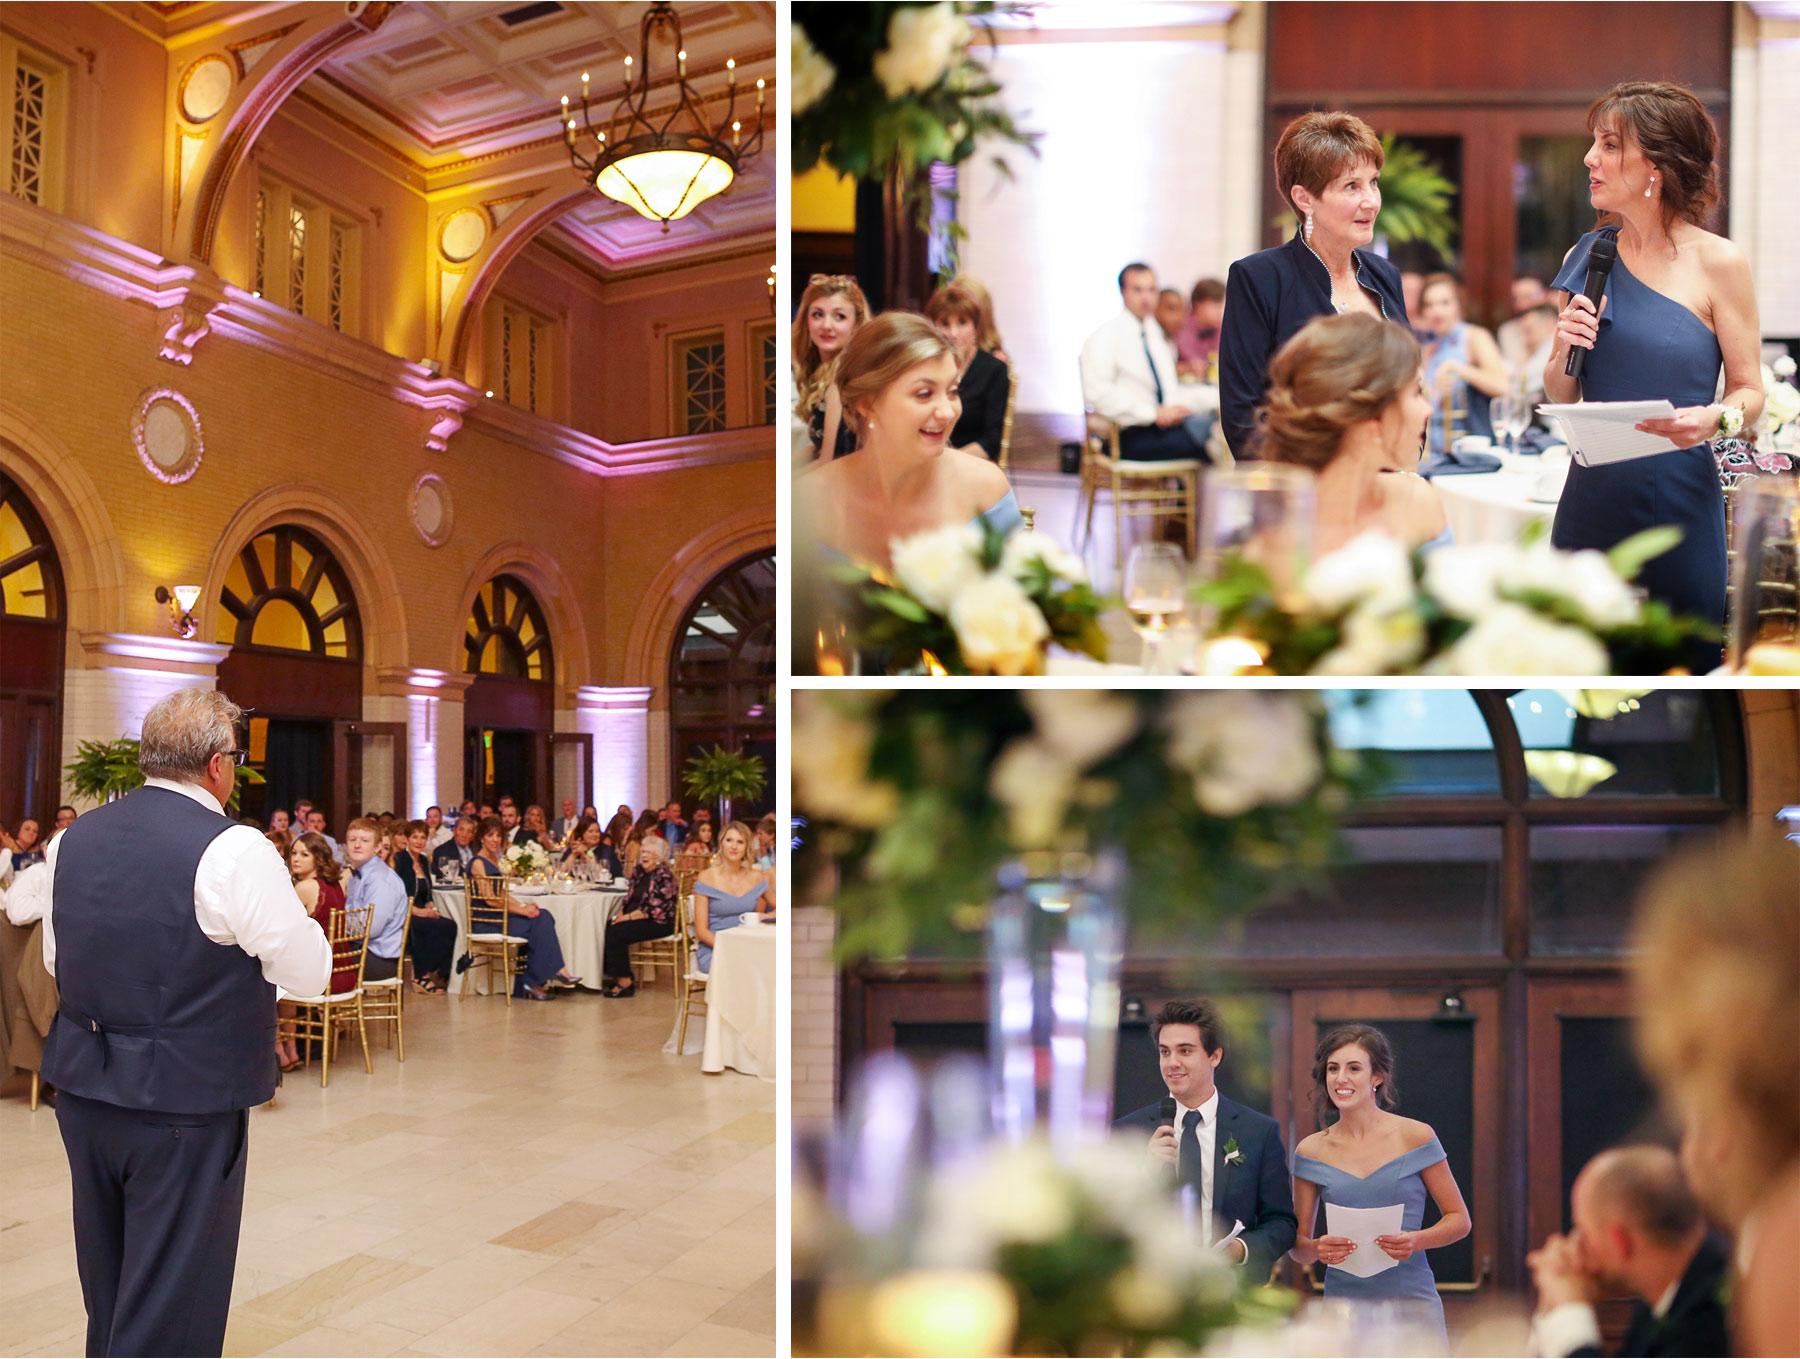 20-Minneapolis-Minnesota-Wedding-Vick-Photography-The-Depot-Reception-Toasts-Amelia-and-Alexander.jpg